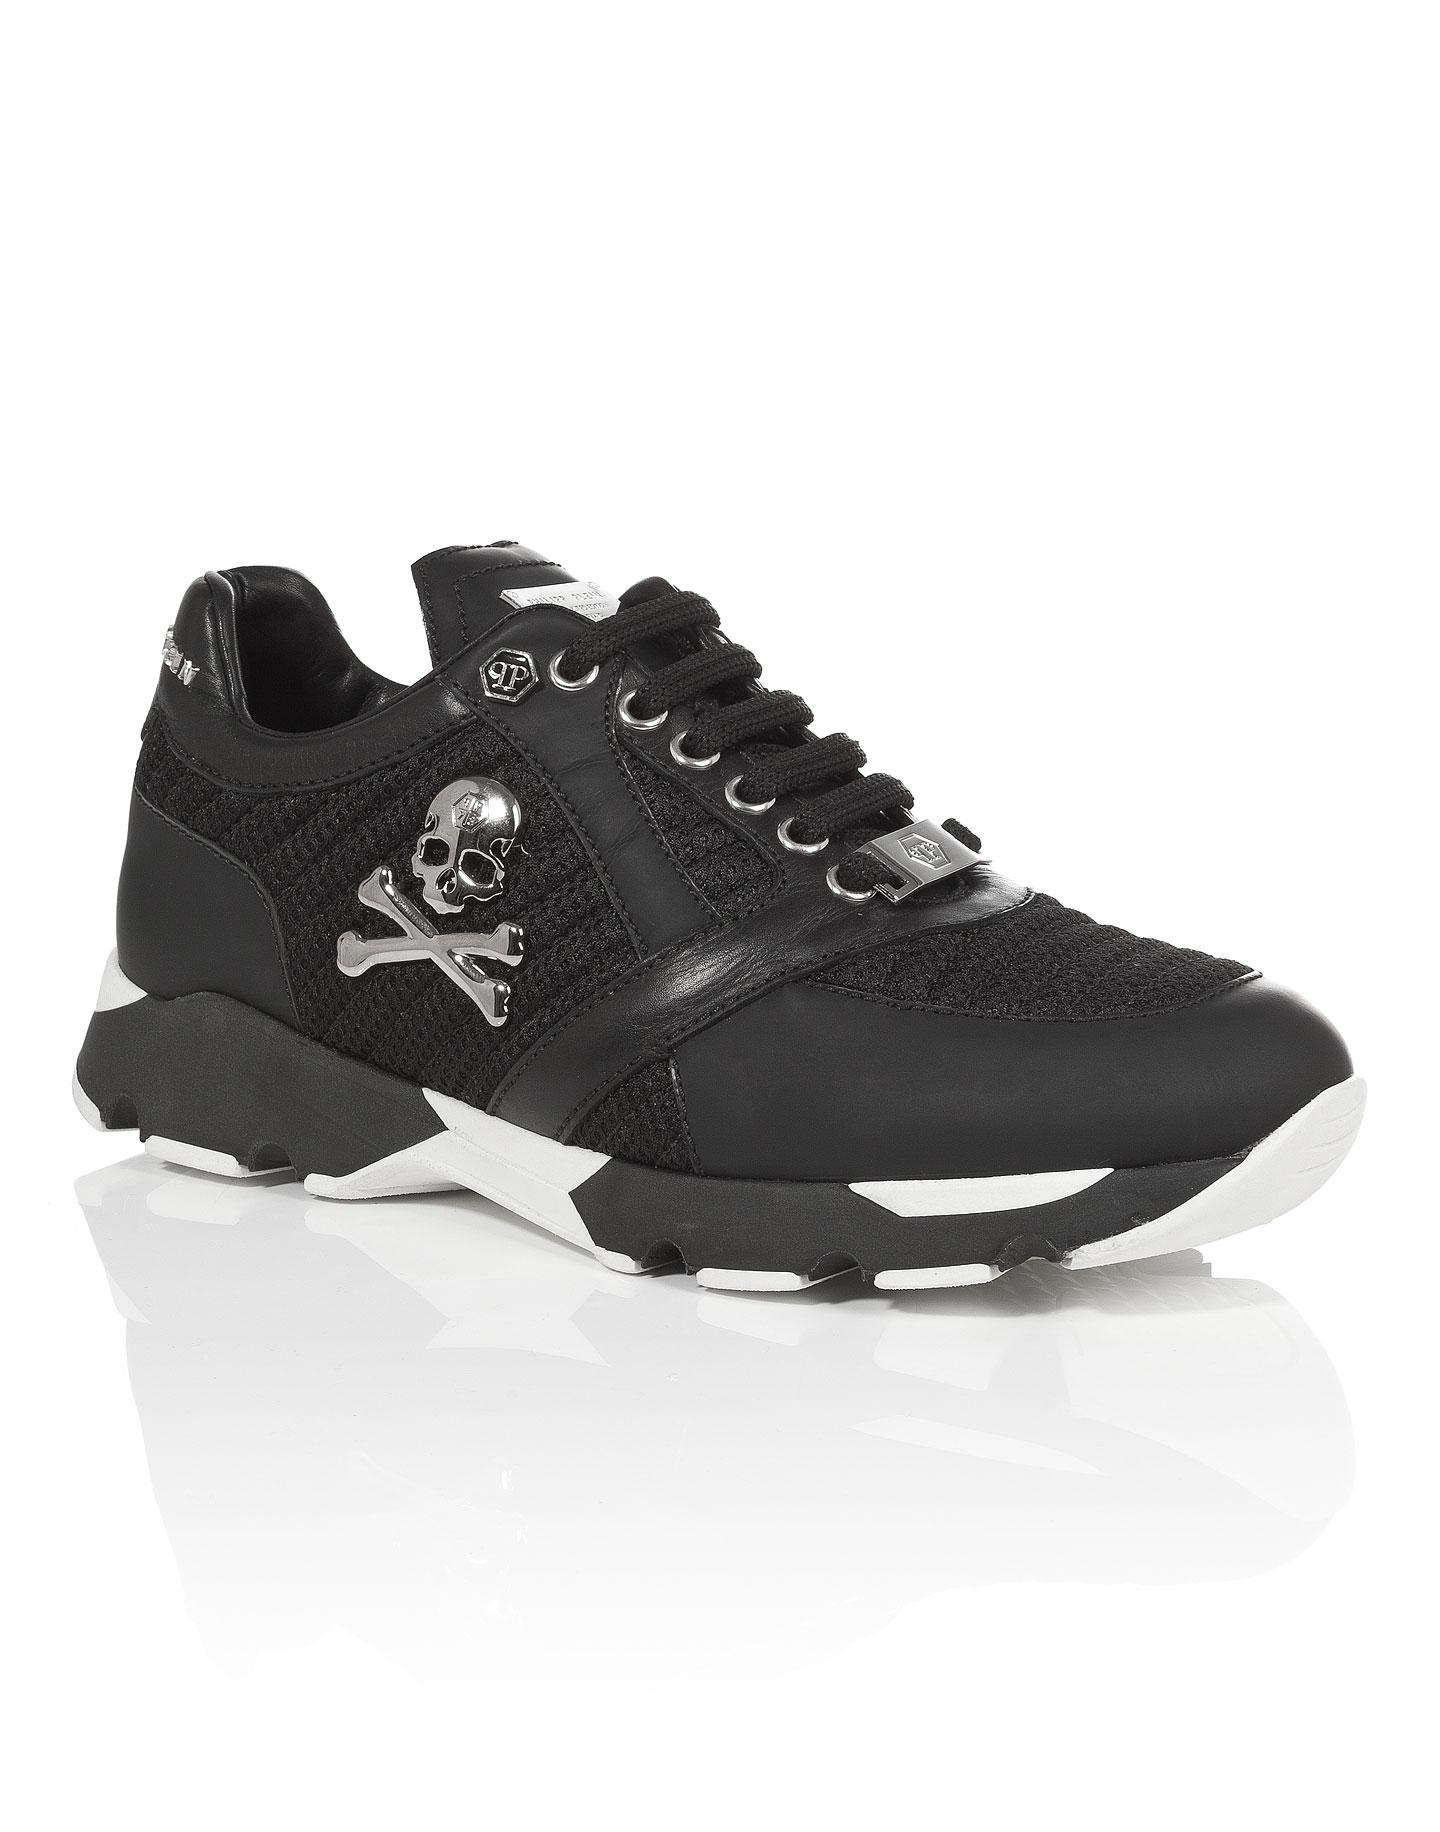 Sneakers Seal Runner Chaussures Plein FemmesPhilipp LqjMzSUVGp